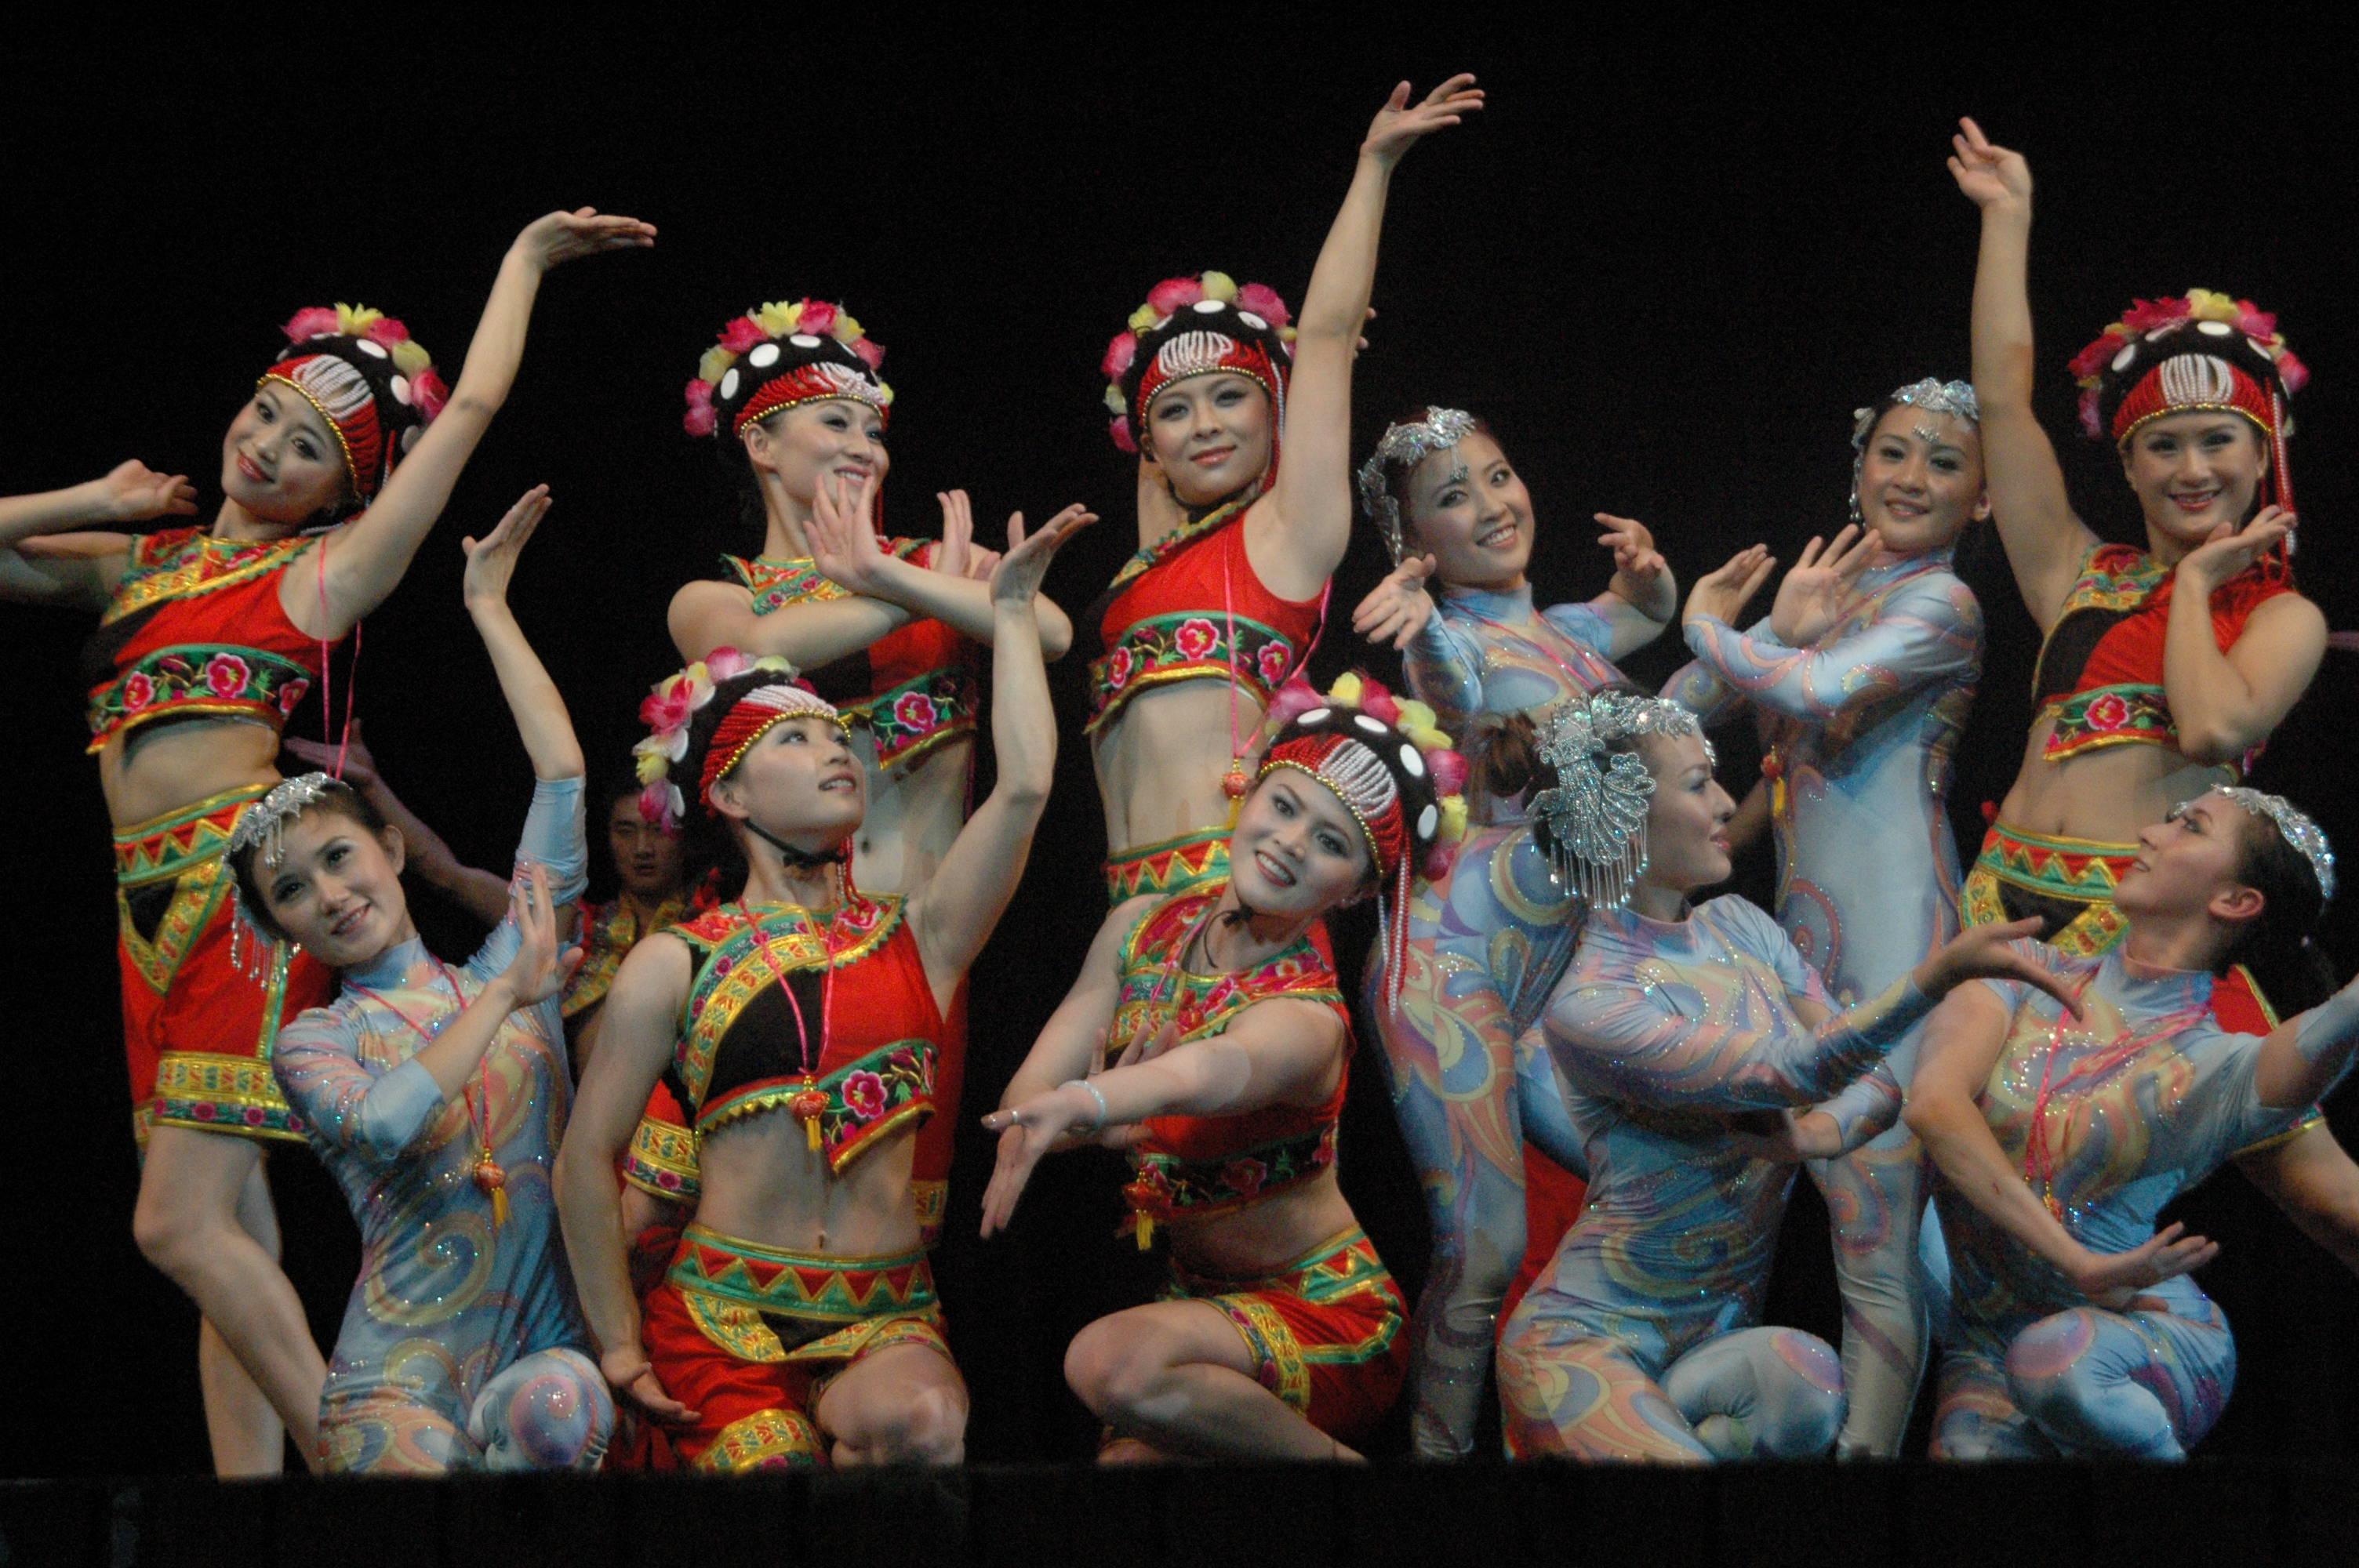 Folk & acrobatic dance from Yunan, China